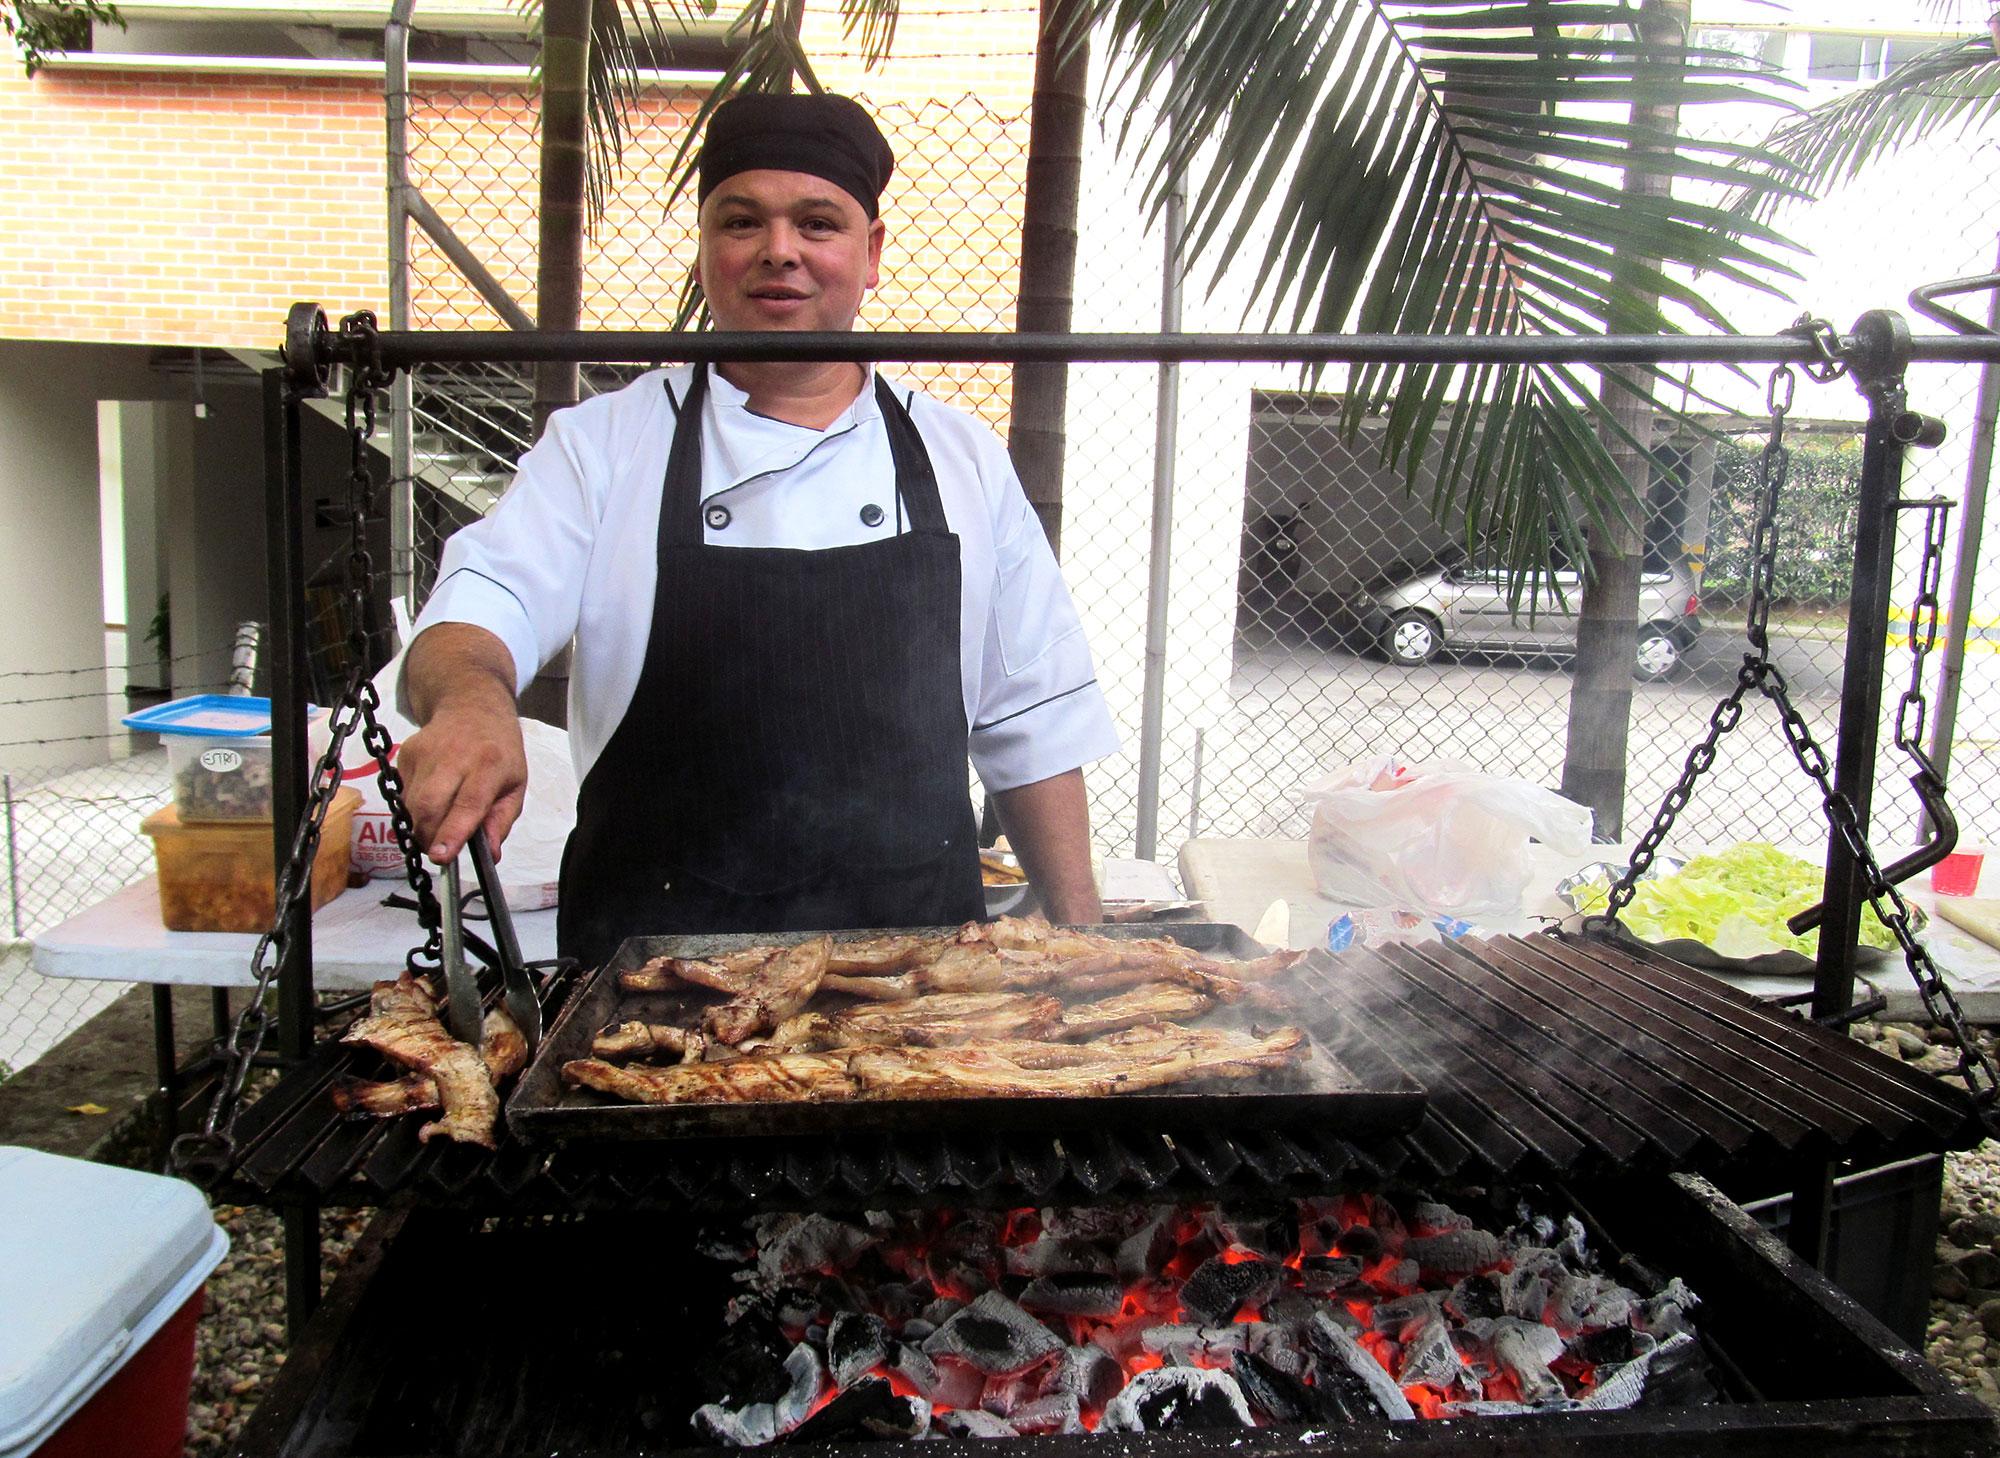 El asado estuvo a cargo de John Mario Agudelo Pineda.